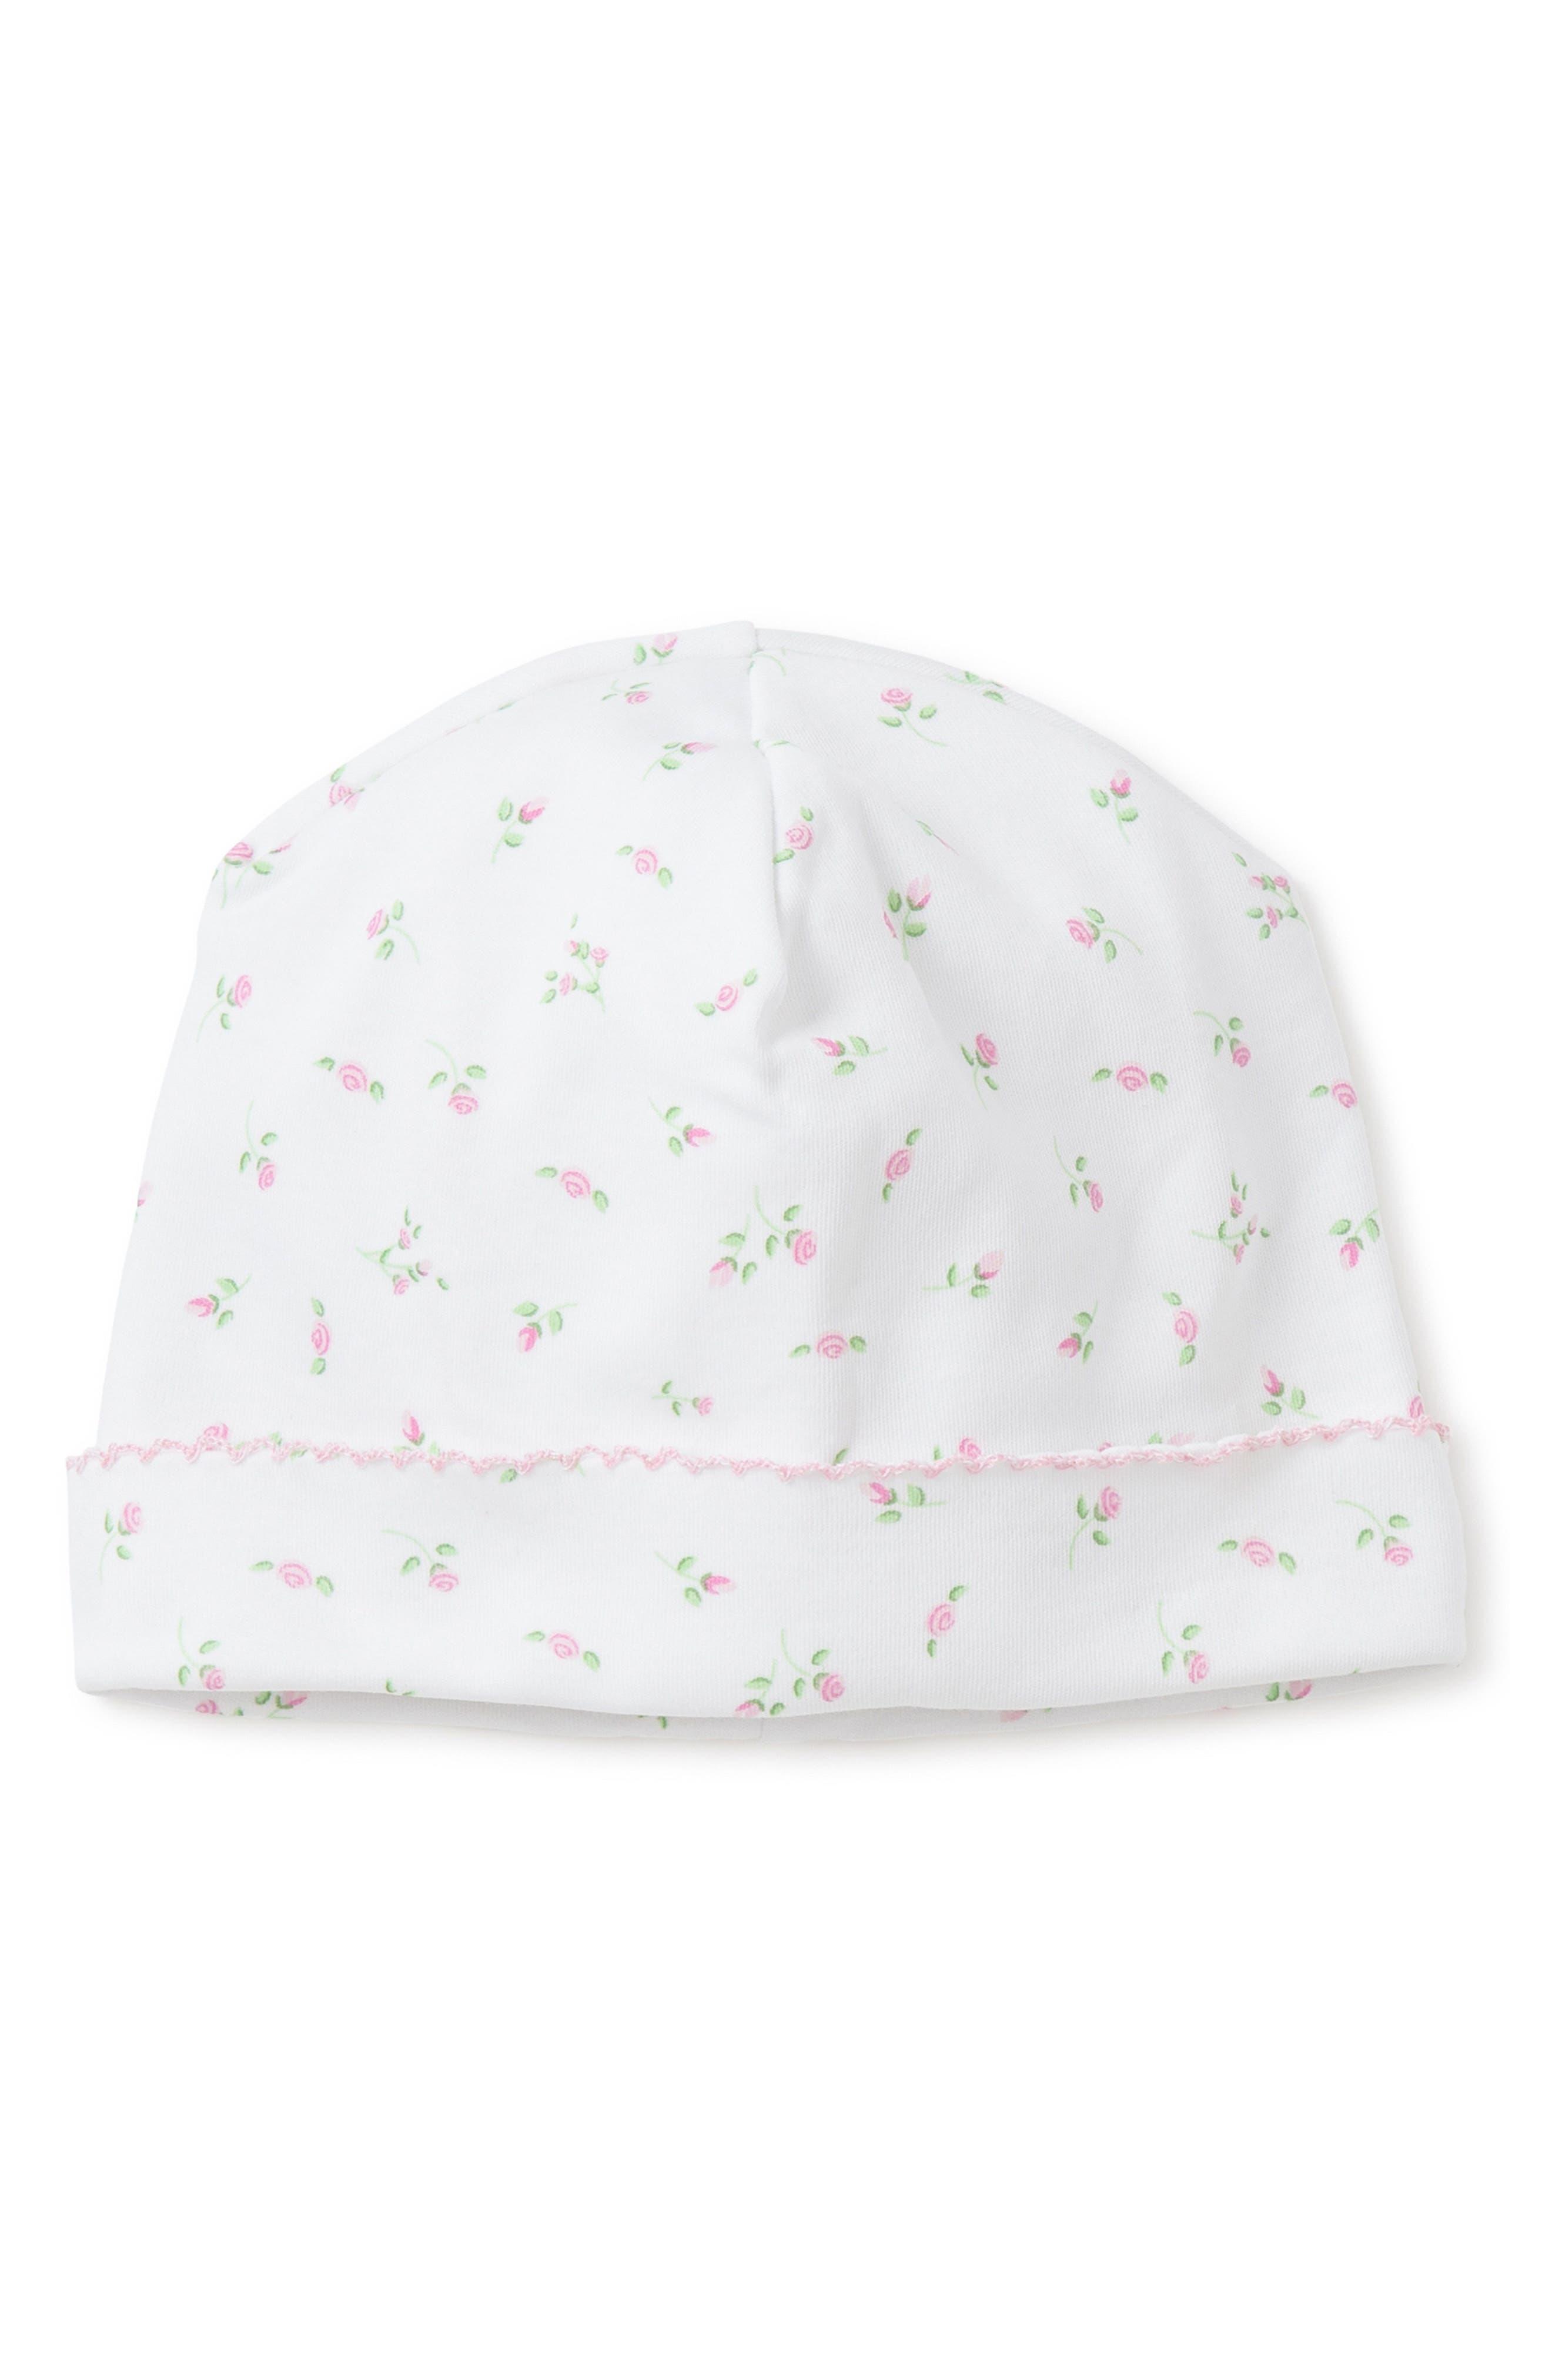 Garden Print Beanie Hat,                             Main thumbnail 1, color,                             WHITE